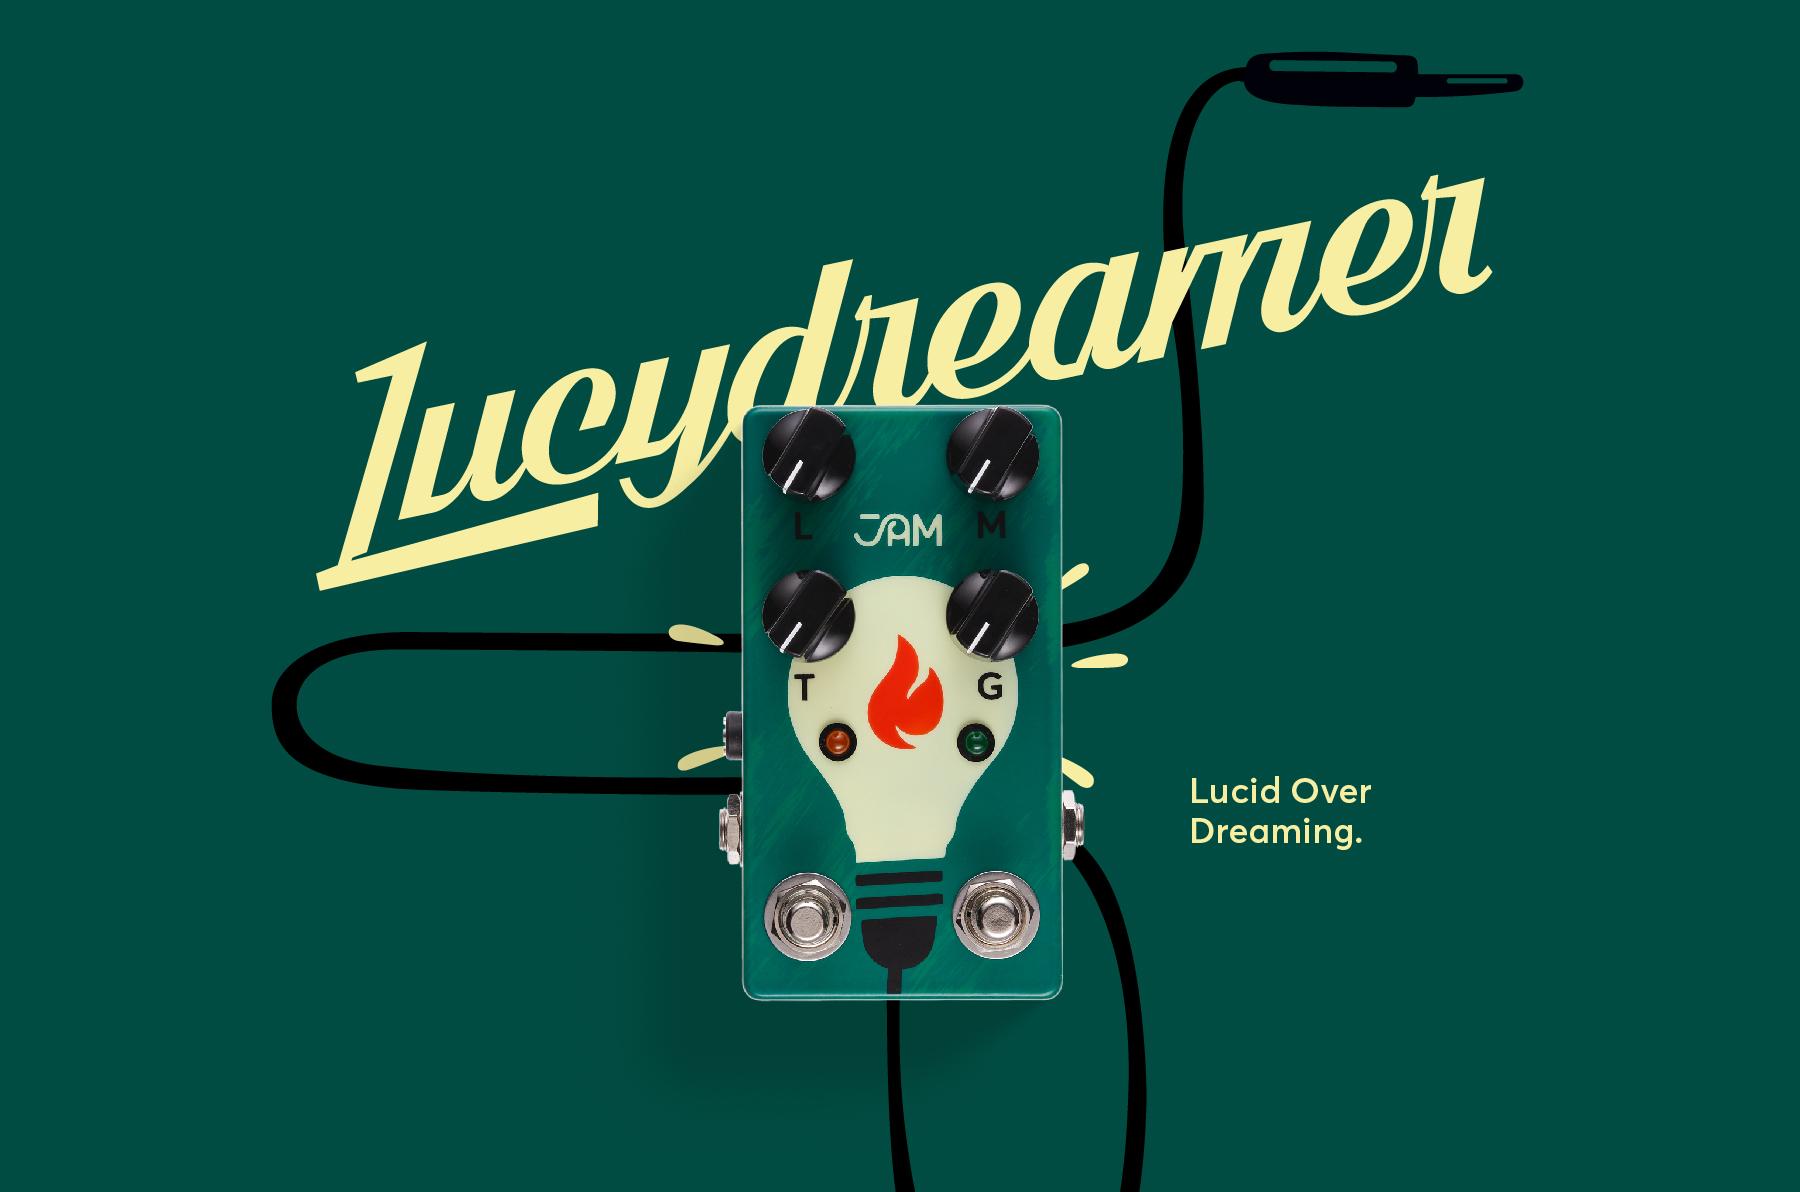 Lucydreamer